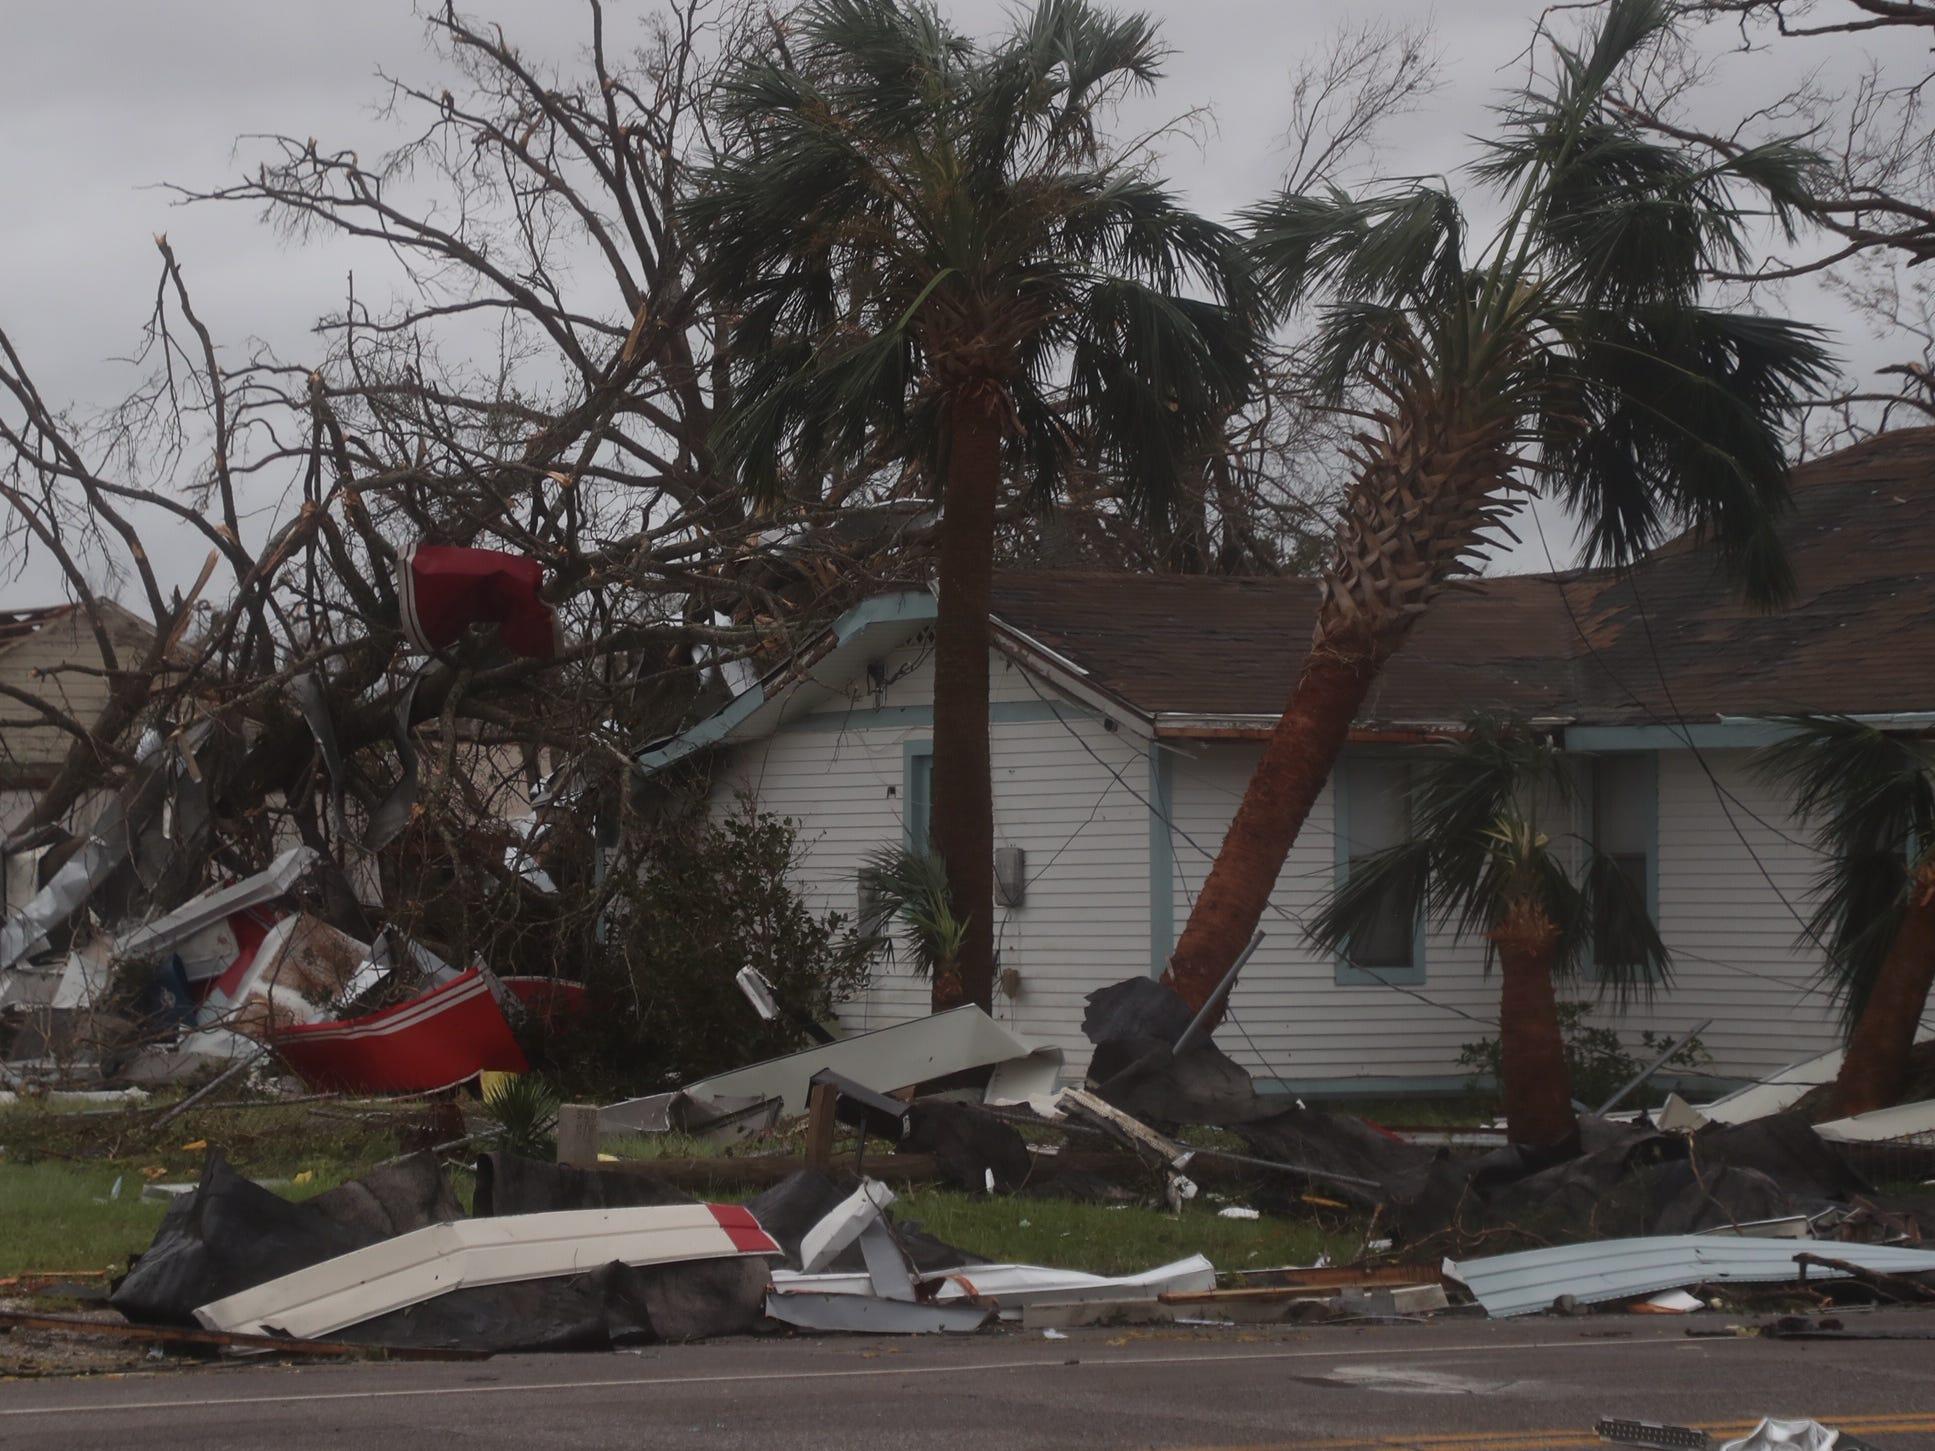 Damage from Hurricane Michael seen in Panama City, Florida.